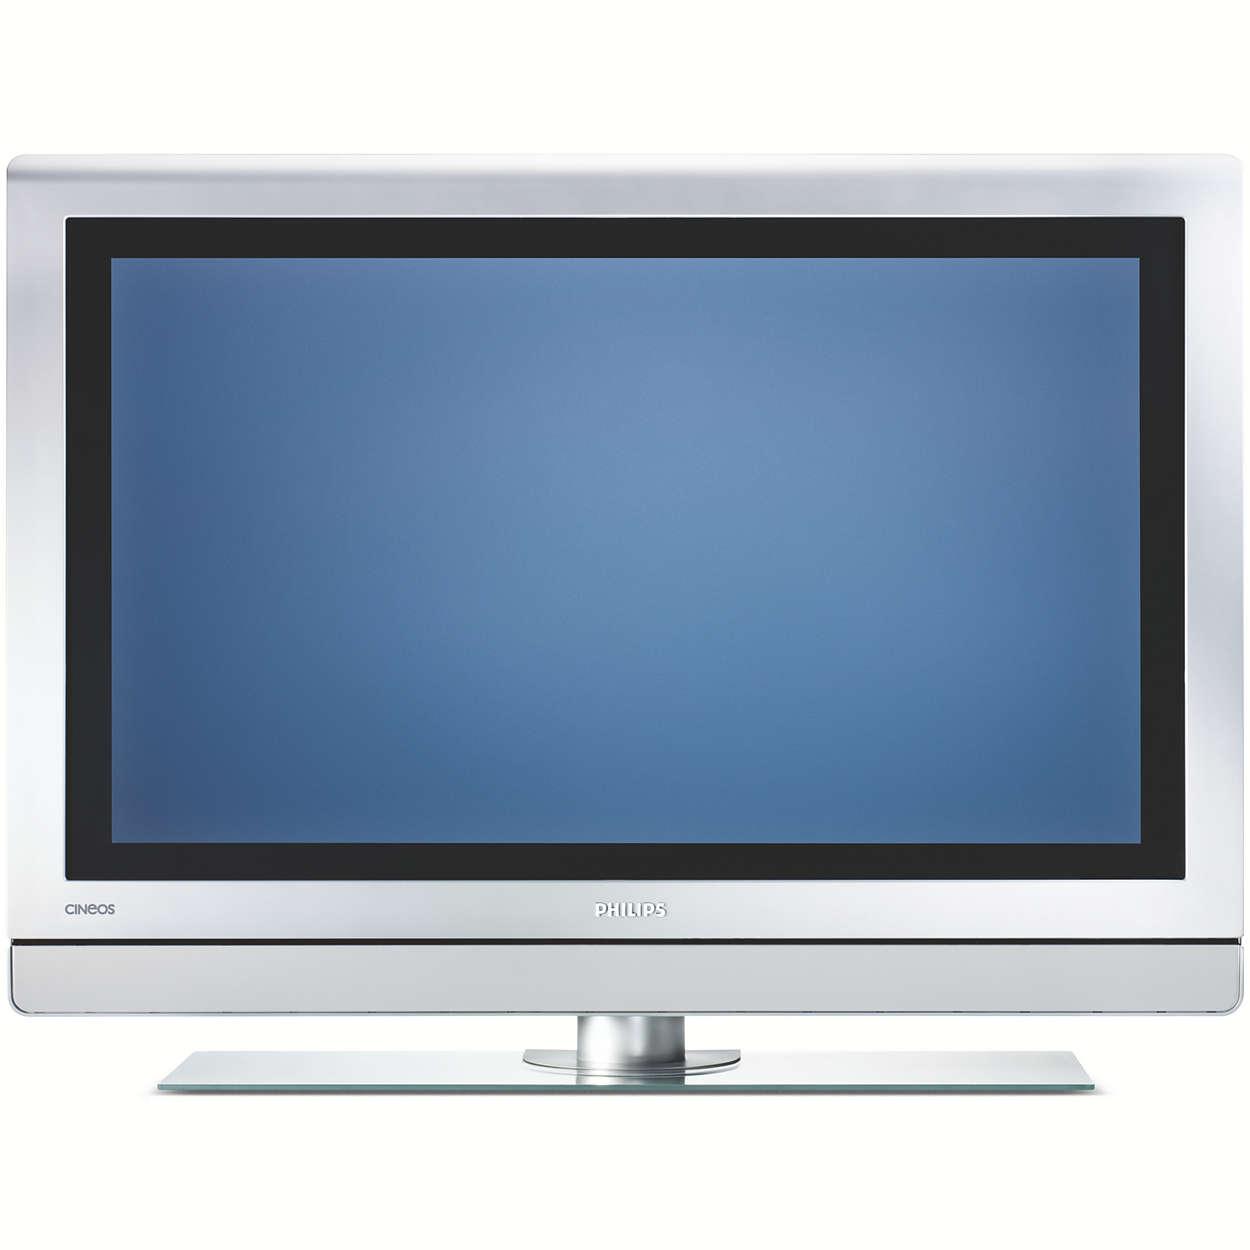 breitbild flachbildfernseher 42pf9966 10 philips. Black Bedroom Furniture Sets. Home Design Ideas